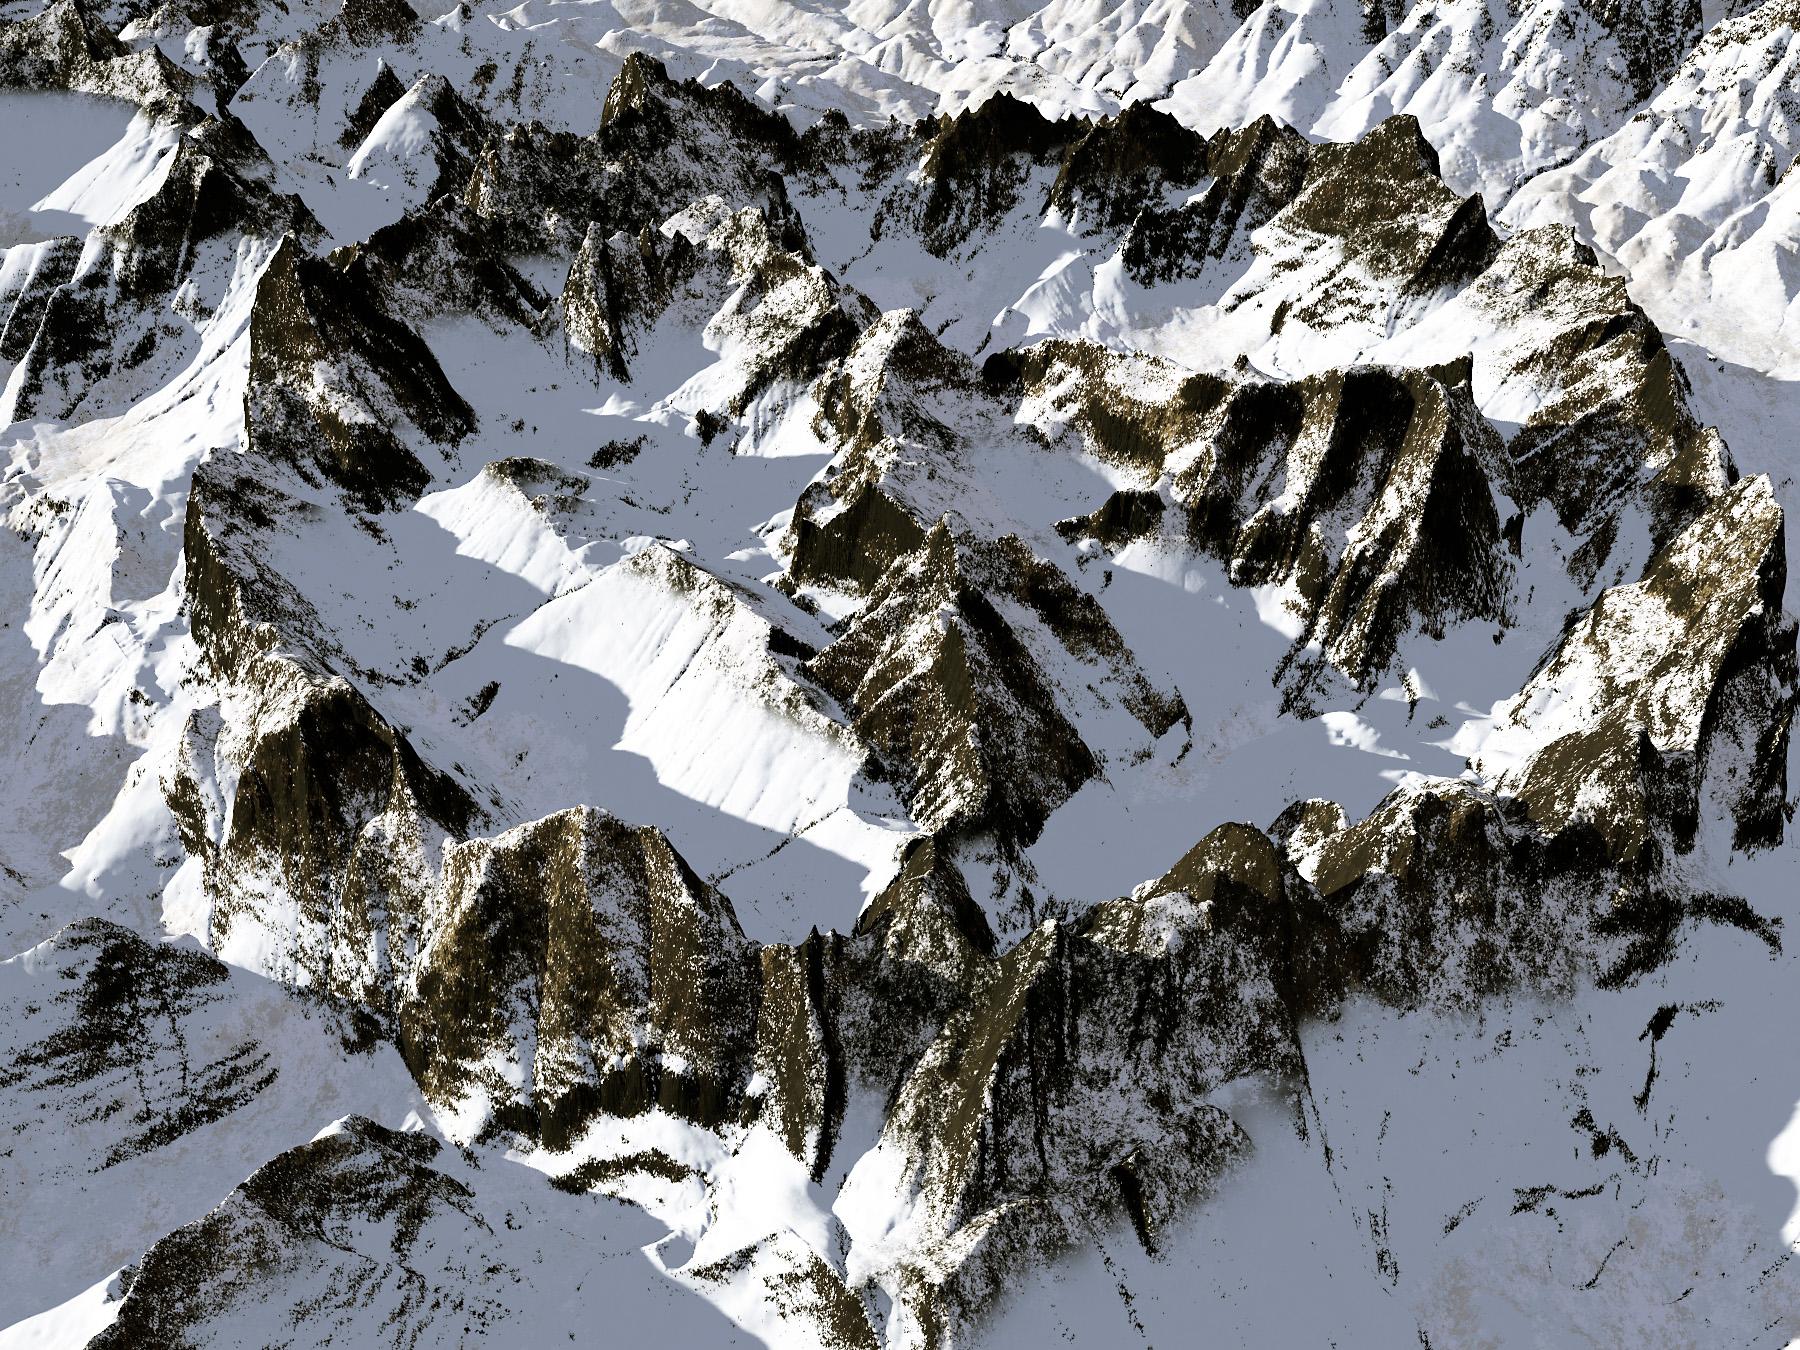 Terragen-generated mountain terrain